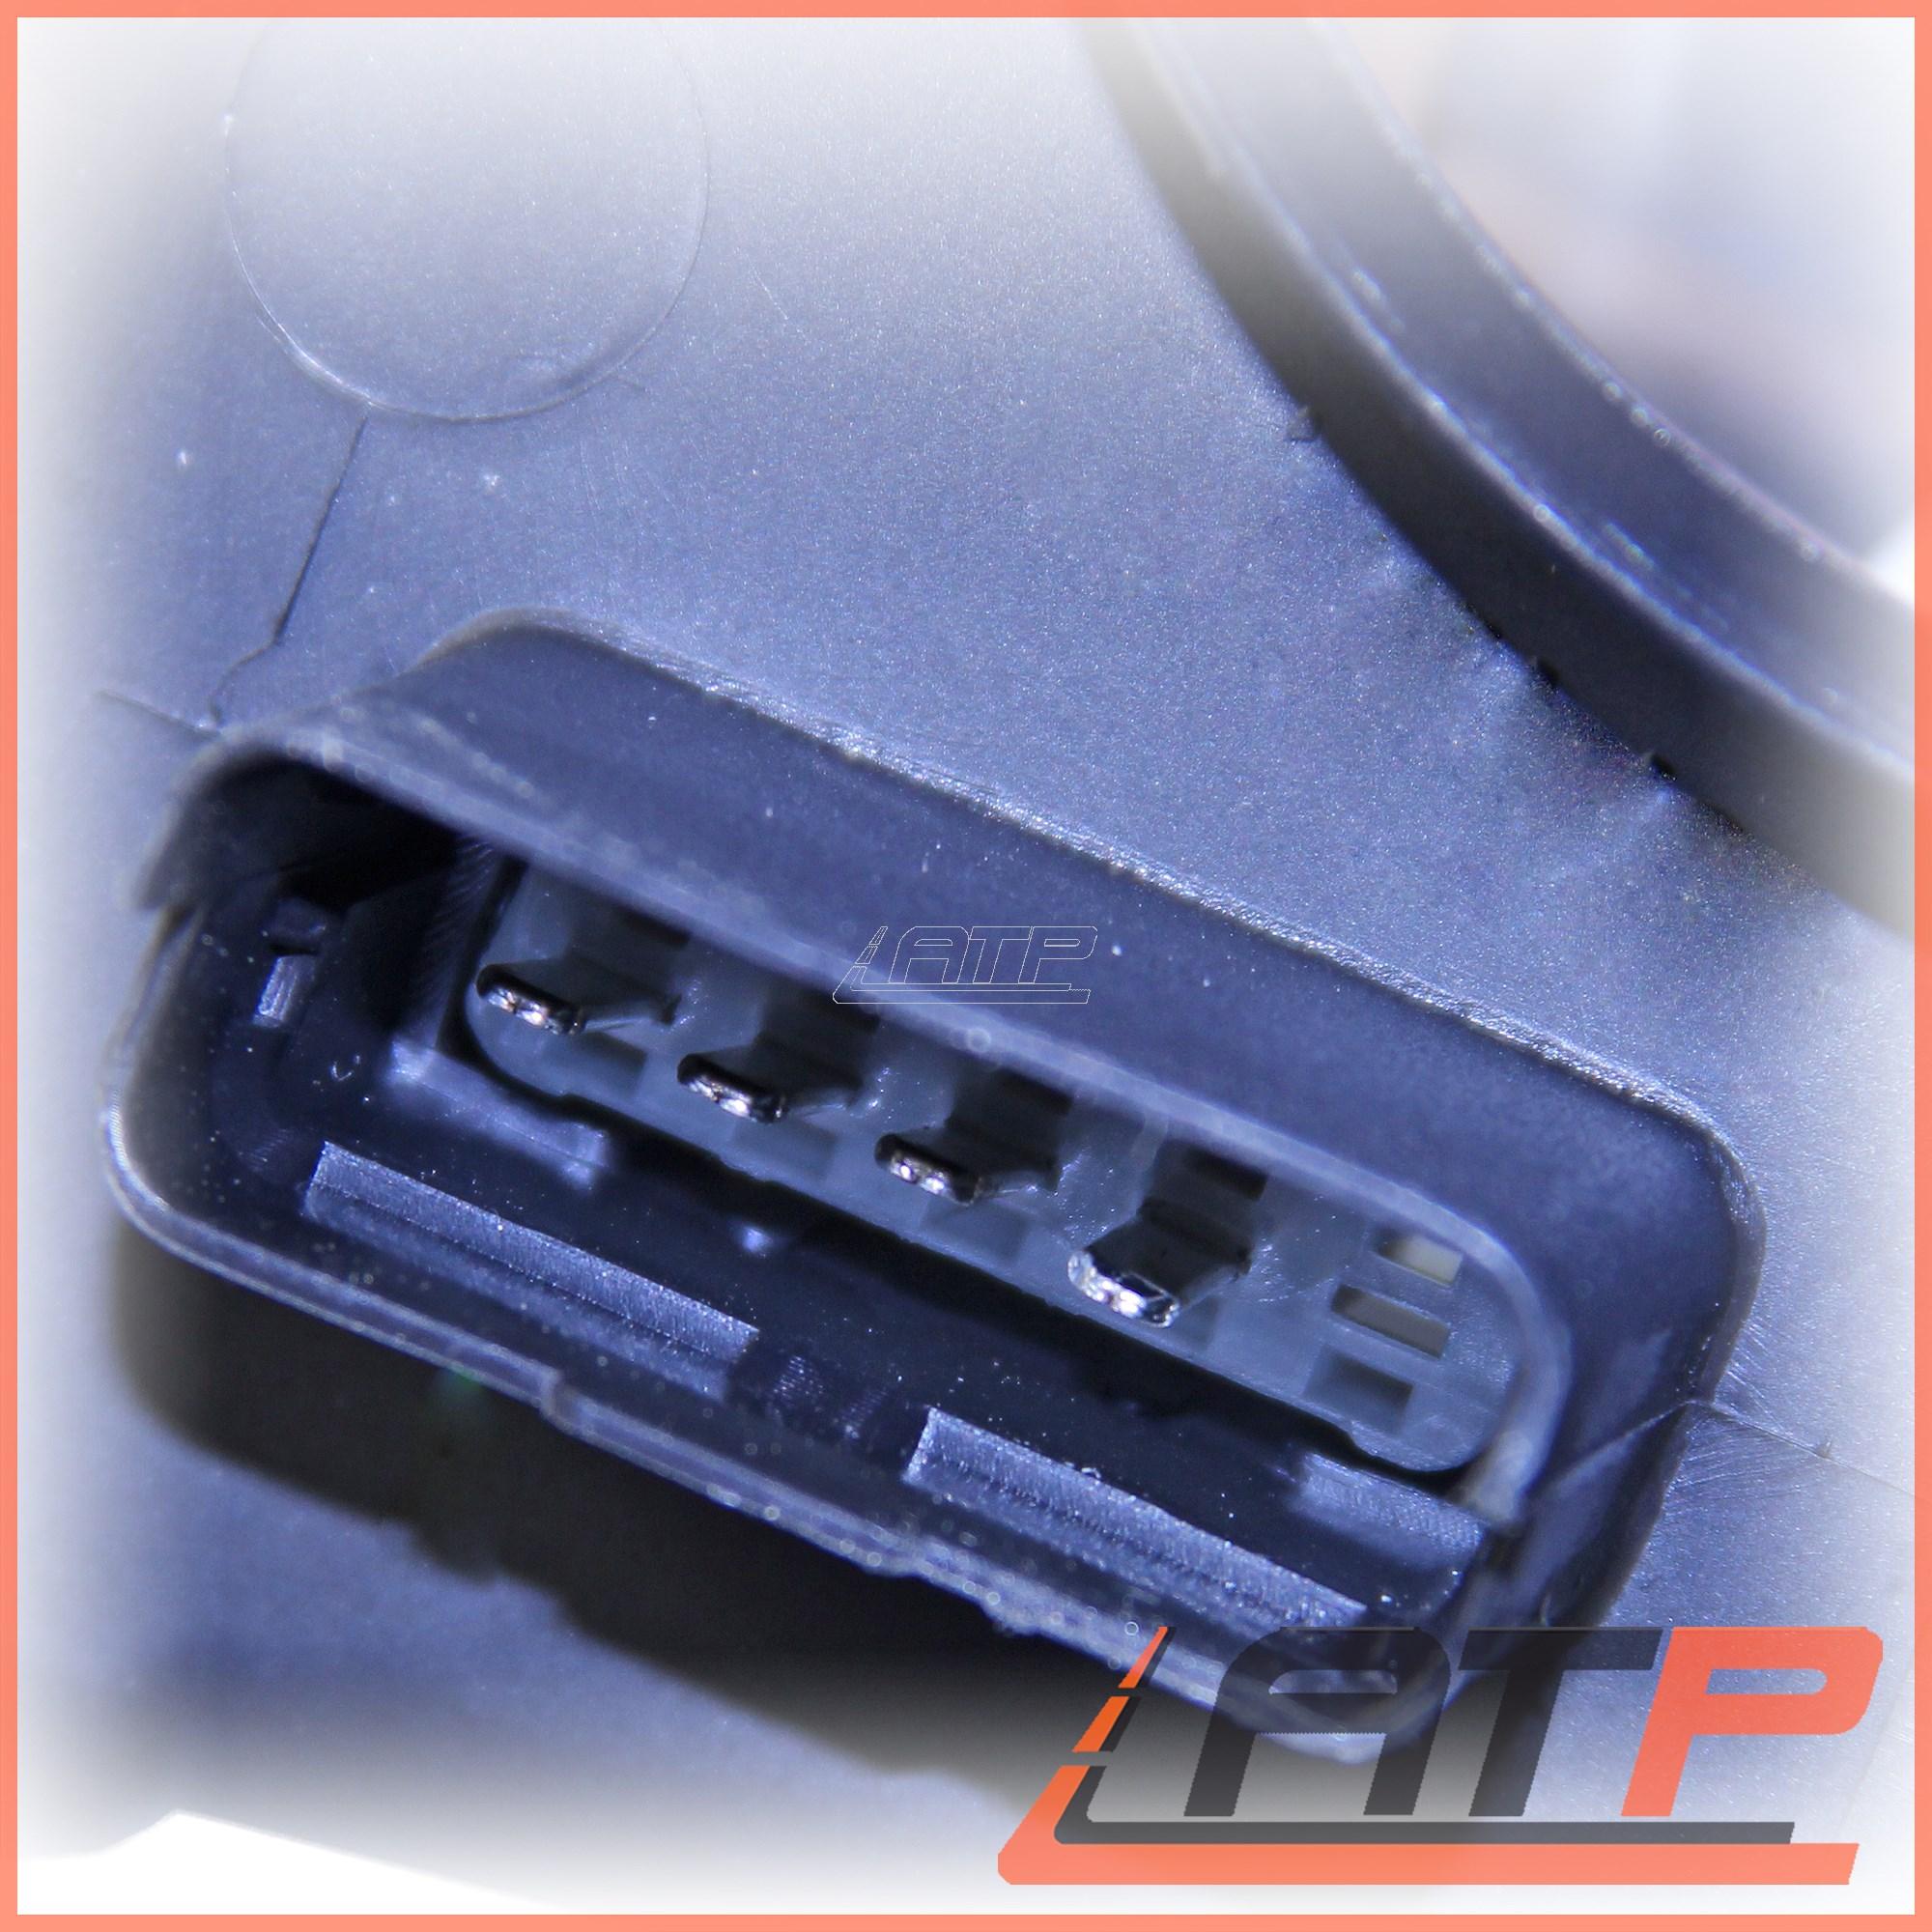 2X HEADLAMP HEADLIGHT H7//H1 FRONT LEFT+RIGHT RENAULT SCENIC MK 2 03-06 1.4-2.0